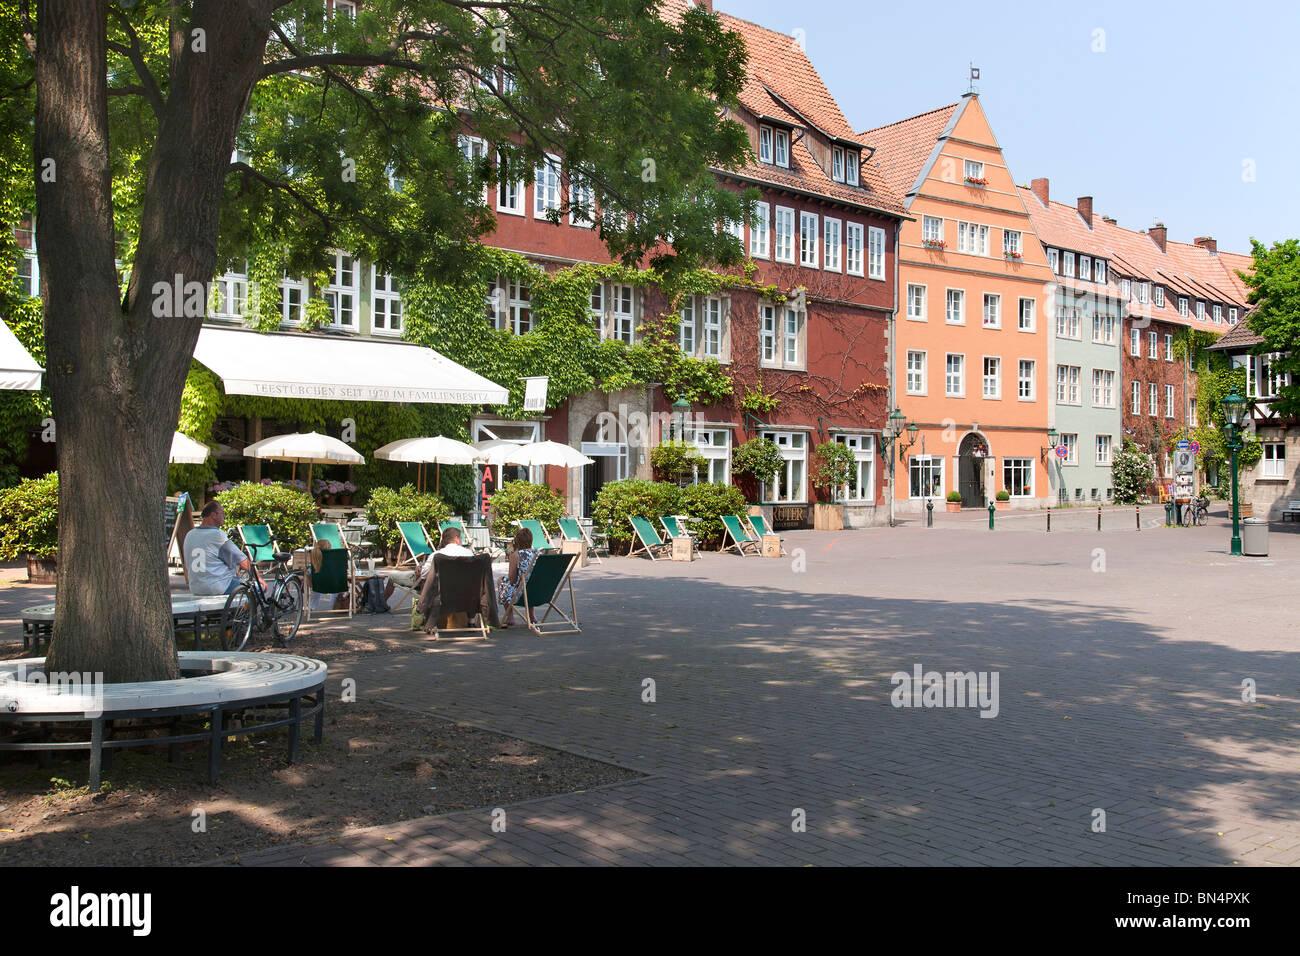 Altstadt, Ballhof, Hannover, Niedersachsen, Deutschland Stockbild